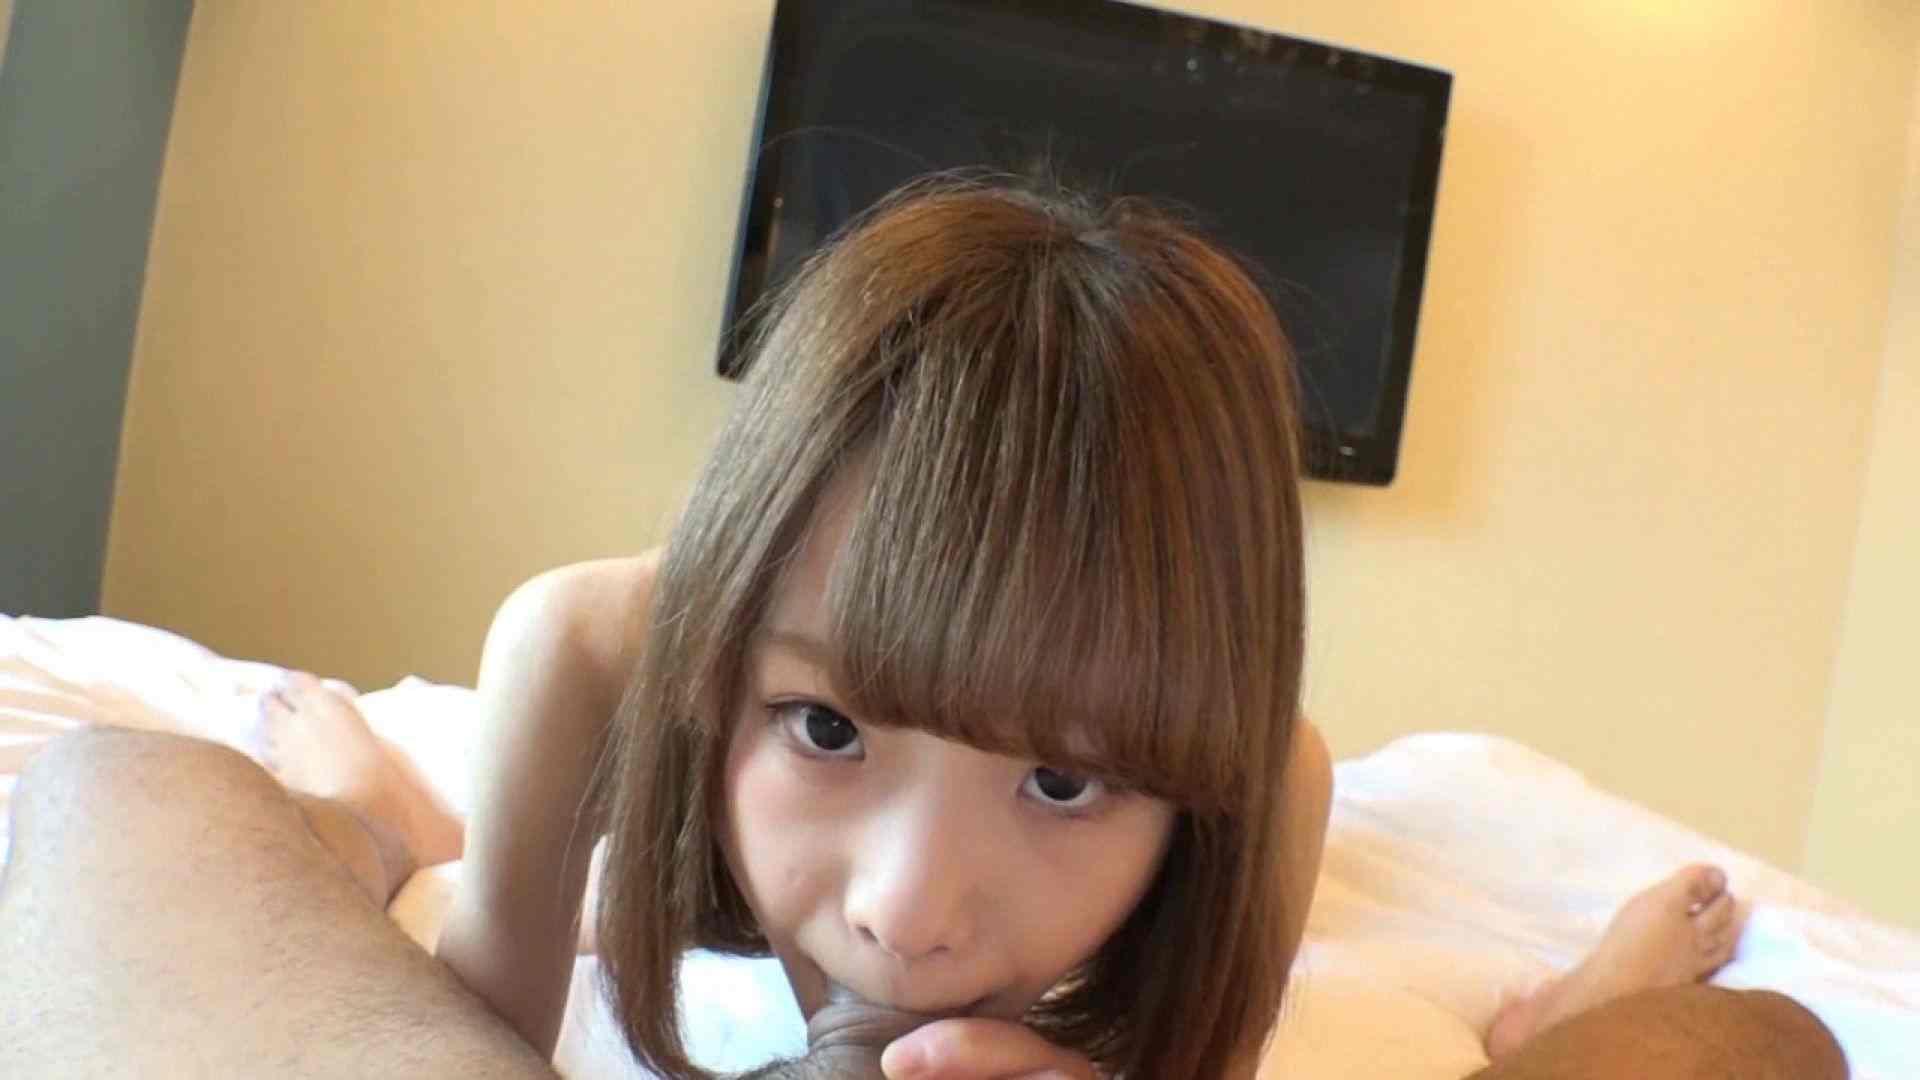 S級厳選美女ビッチガールVol.32 前編 ロリ セックス無修正動画無料 109PIX 24